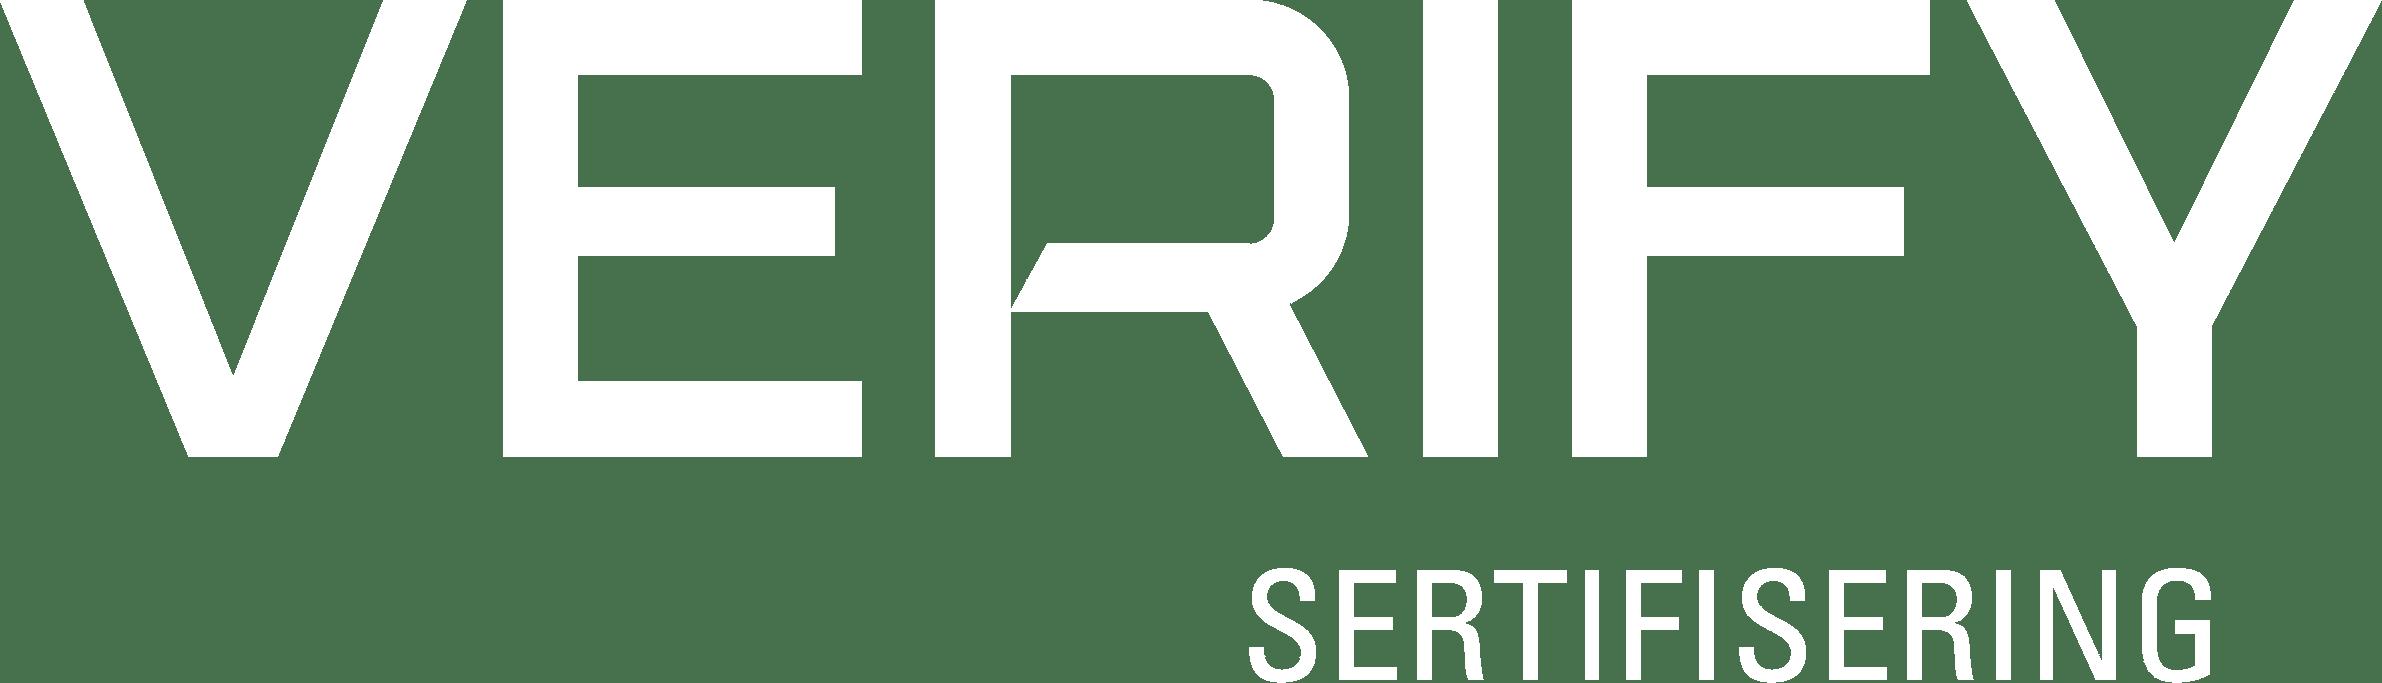 Verify Sertifisering